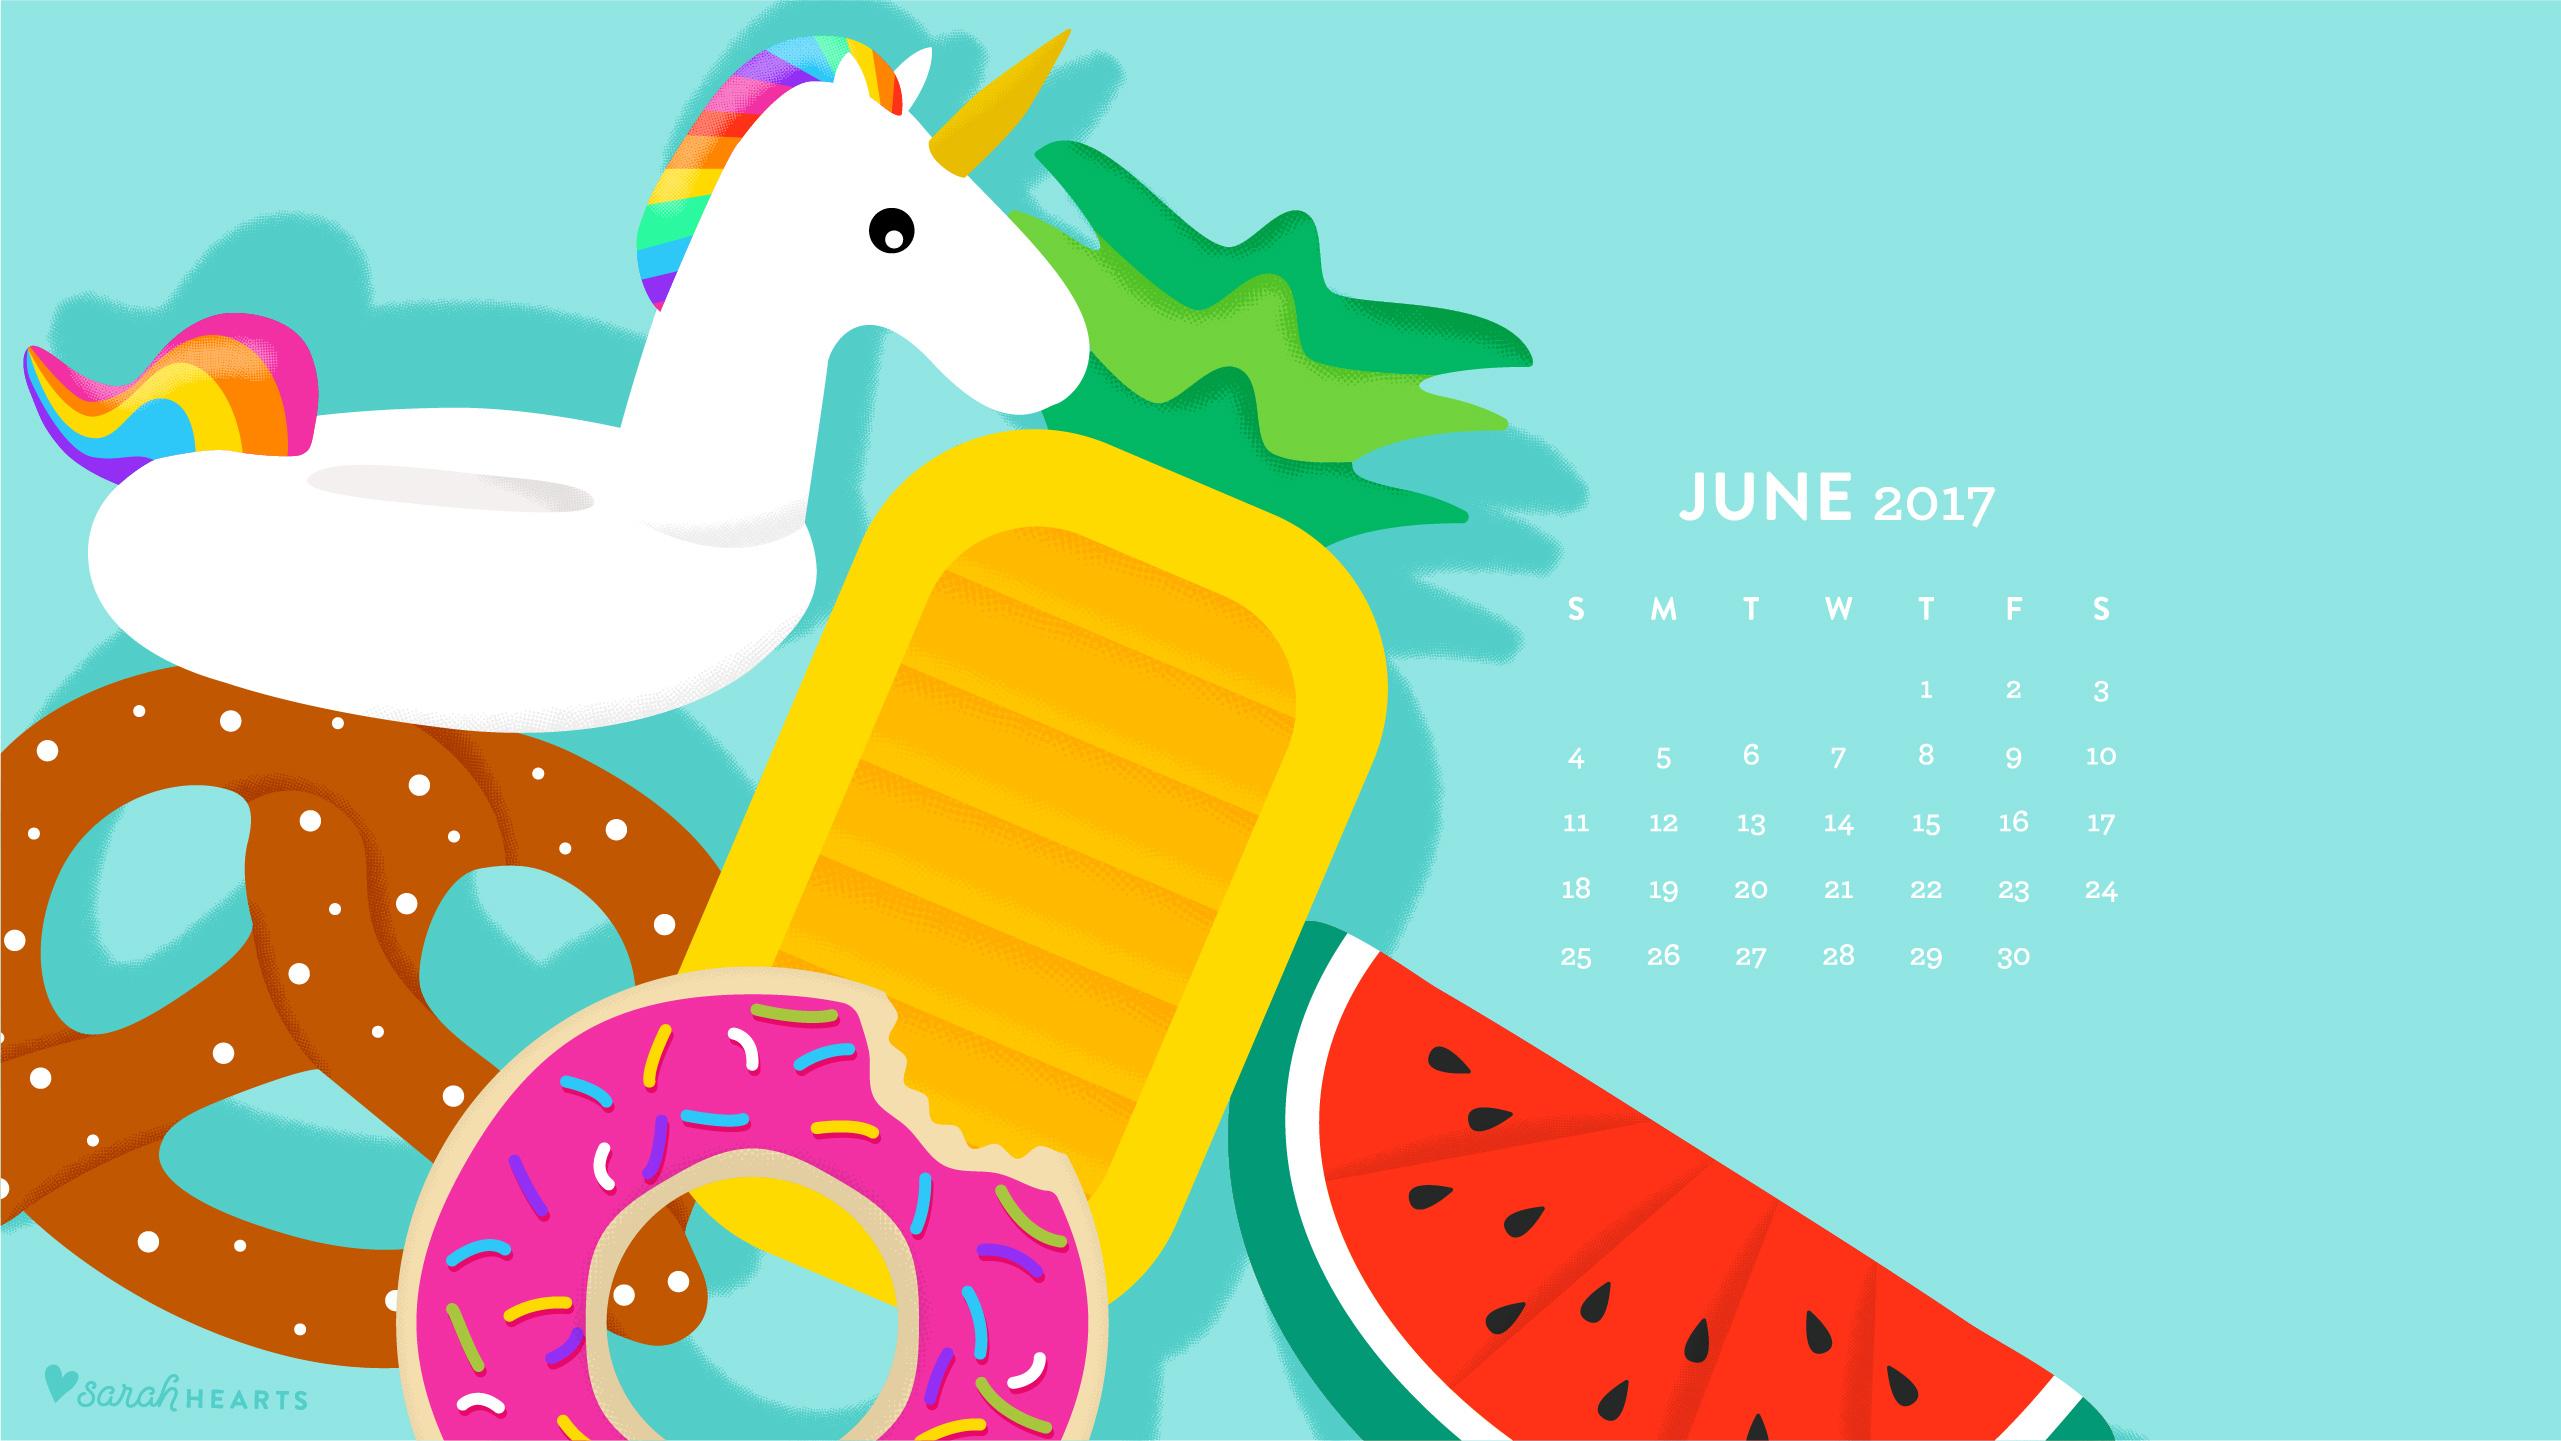 June 2017 Pool Float Calendar Wallpaper   Sarah Hearts 2561x1441